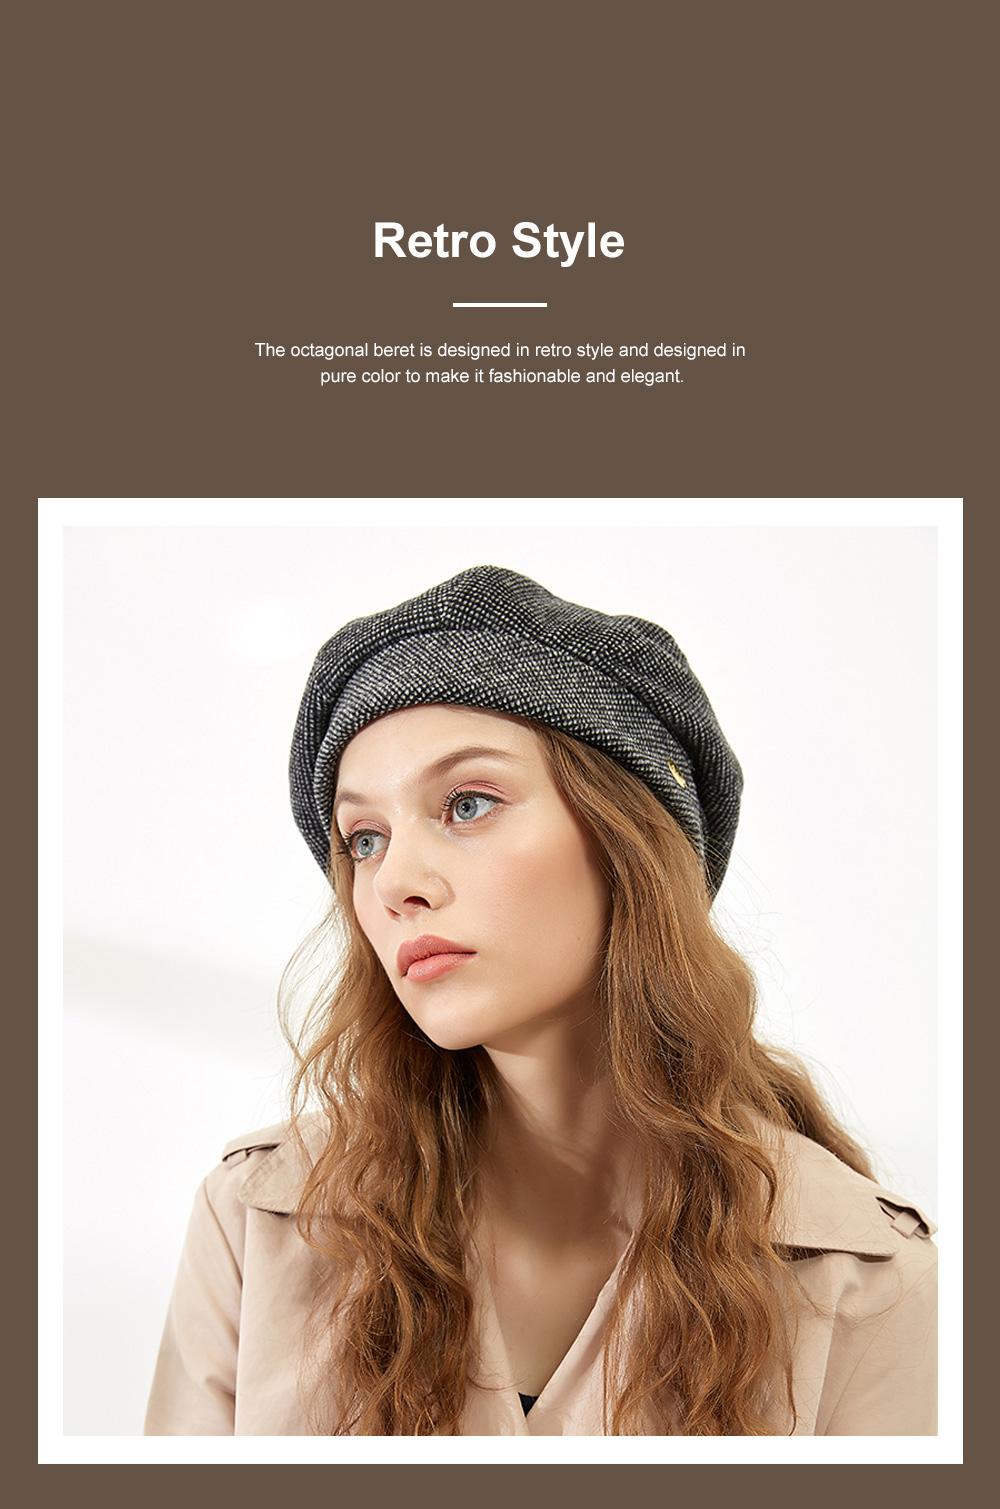 Retro Octagonal Beret for Travelling Breathable Woolen Pumpkin Hat Adjustable Head Circumference Top Hat Green Beret 2